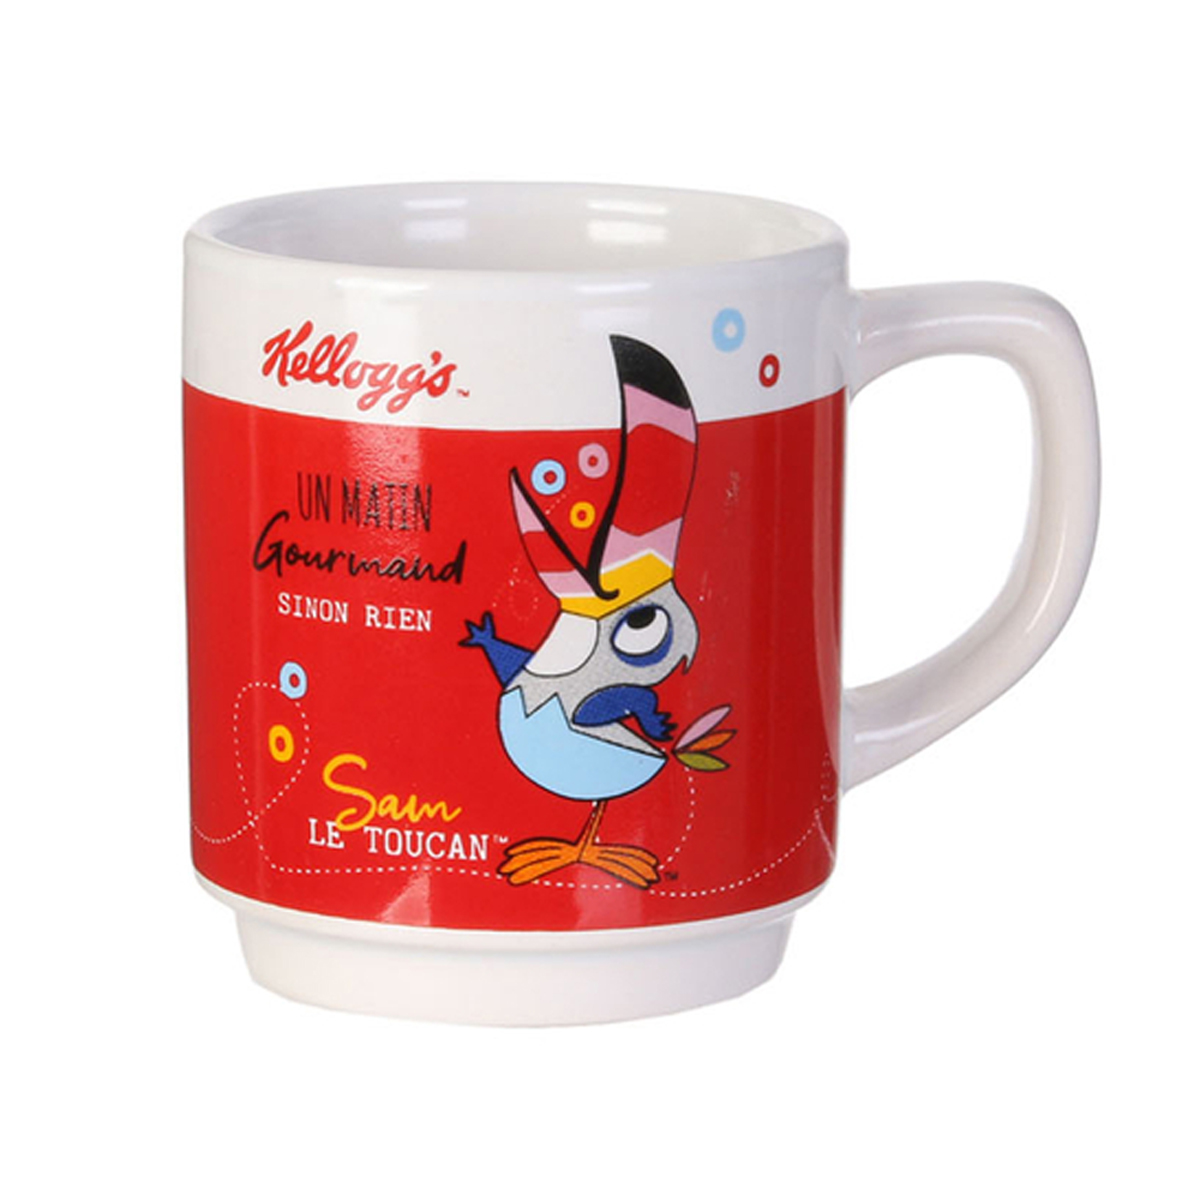 Mug céramique empilable \'Kellogg\'s\' rouge - 8x6 cm (12 cl) - [A1751]